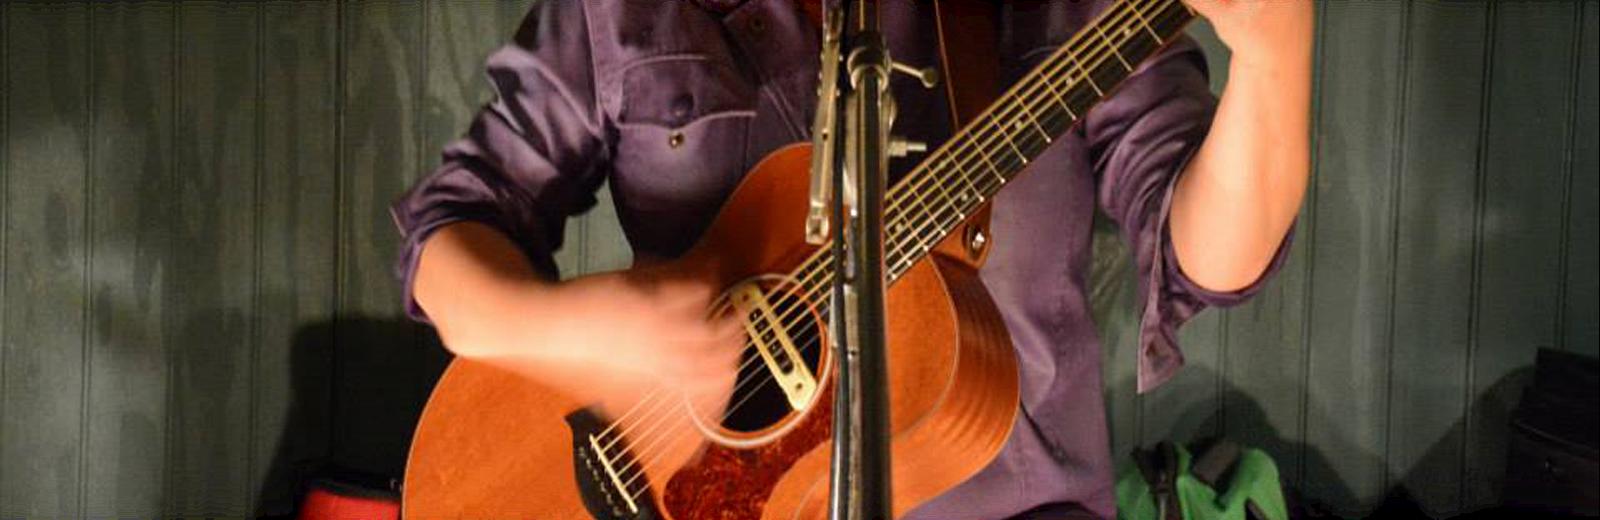 slider-guitar-1600×540